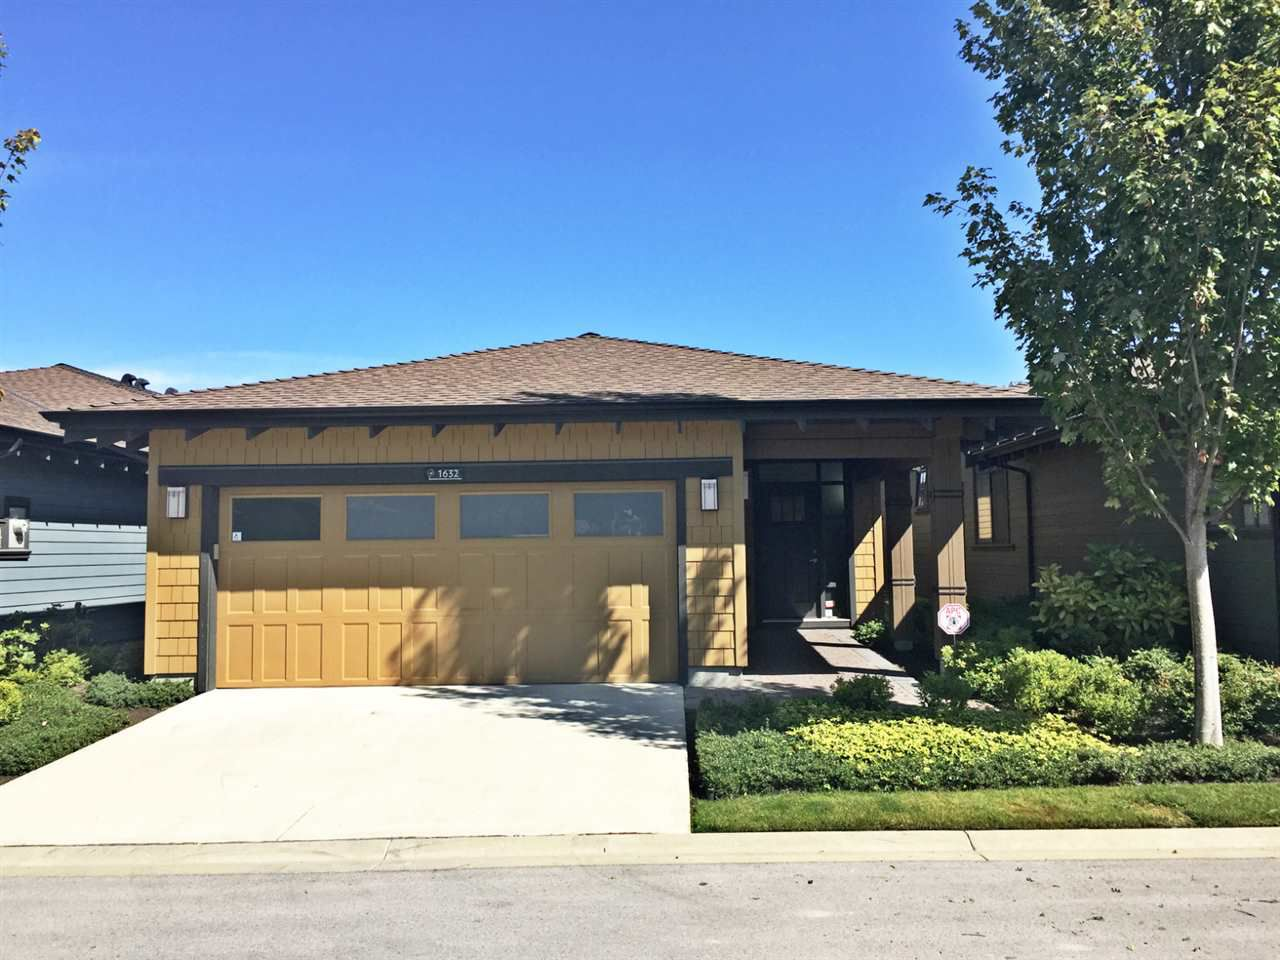 "Main Photo: 1632 BIRCH SPRINGS Lane in Tsawwassen: Cliff Drive House for sale in ""Tsawwassen Springs"" : MLS®# R2199003"